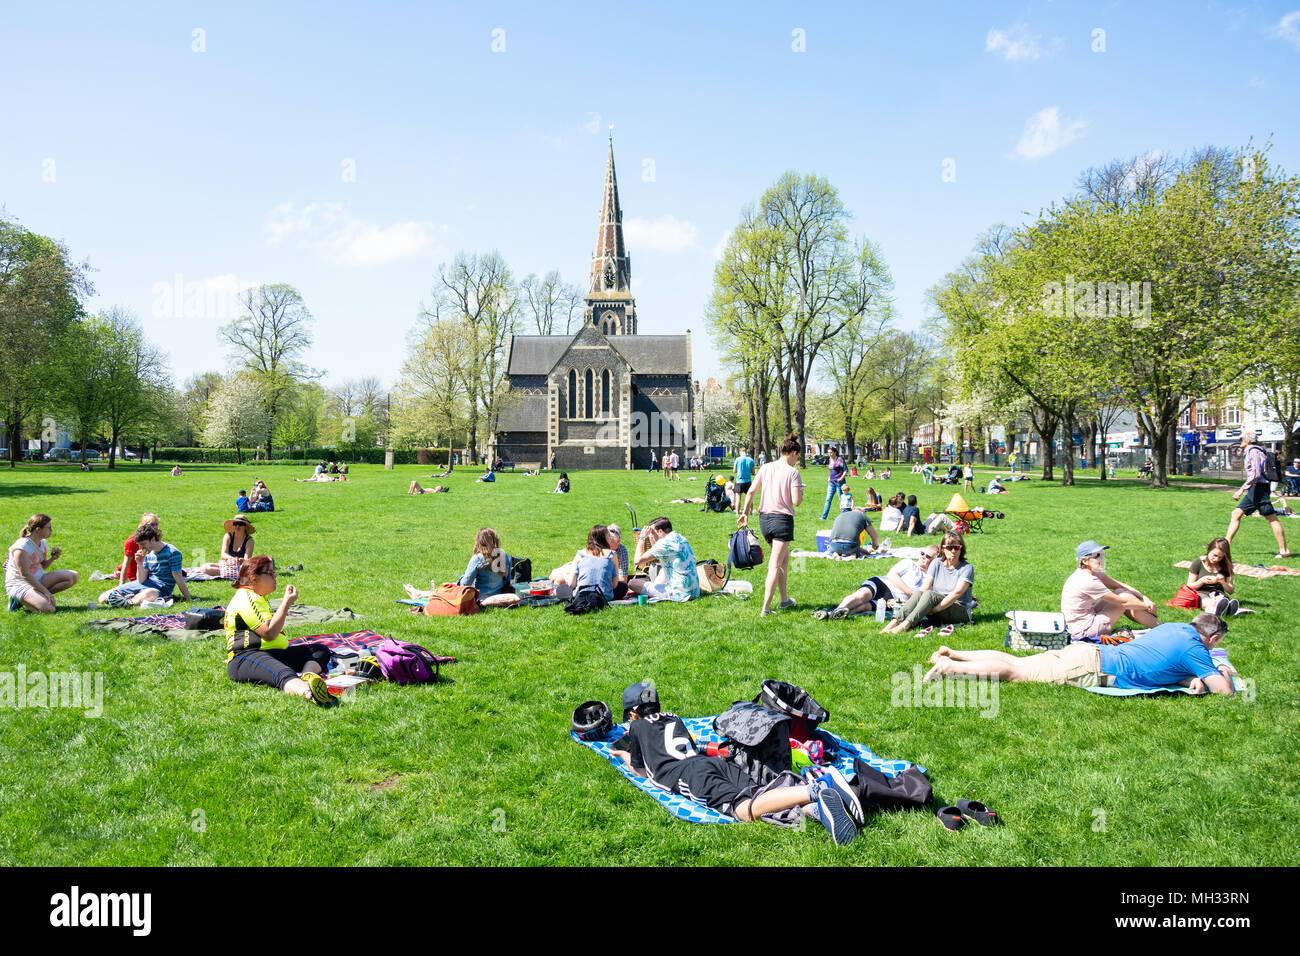 Turnham Green Church and sunbathers on grass, Turnham Green, Chiswick, London Borough of Hounslow, Greater London, England, United Kingdom - Stock Image